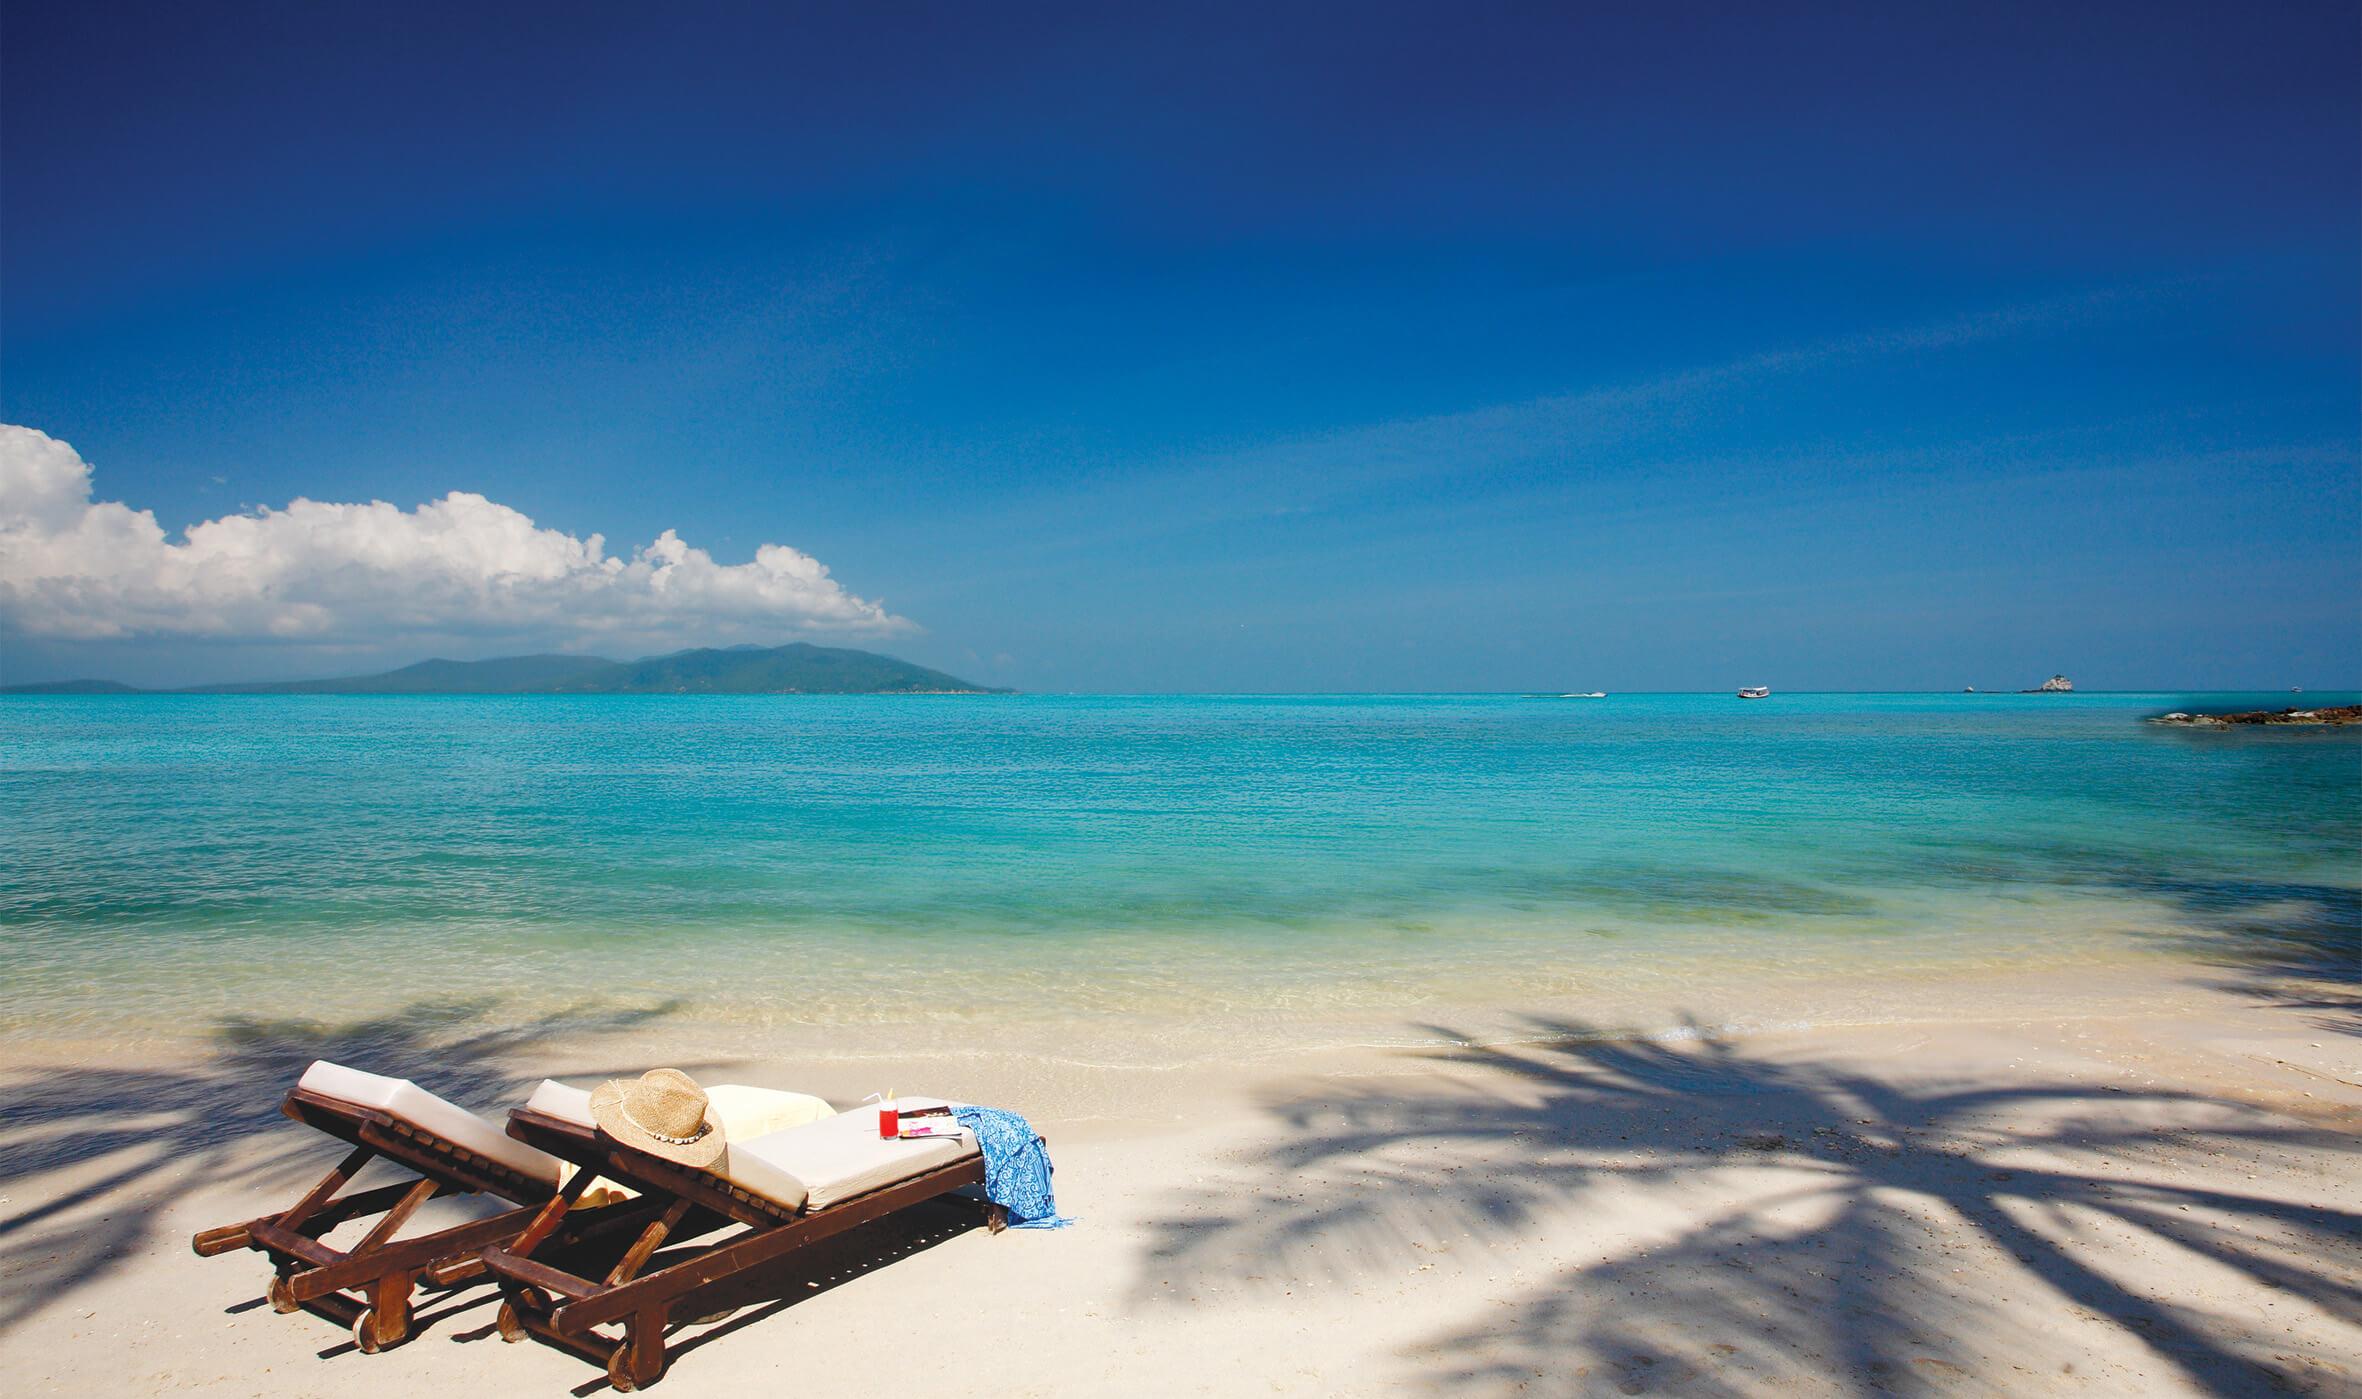 Koh Samui Beach front at Melati Beach Resort & Spa in Thailand.